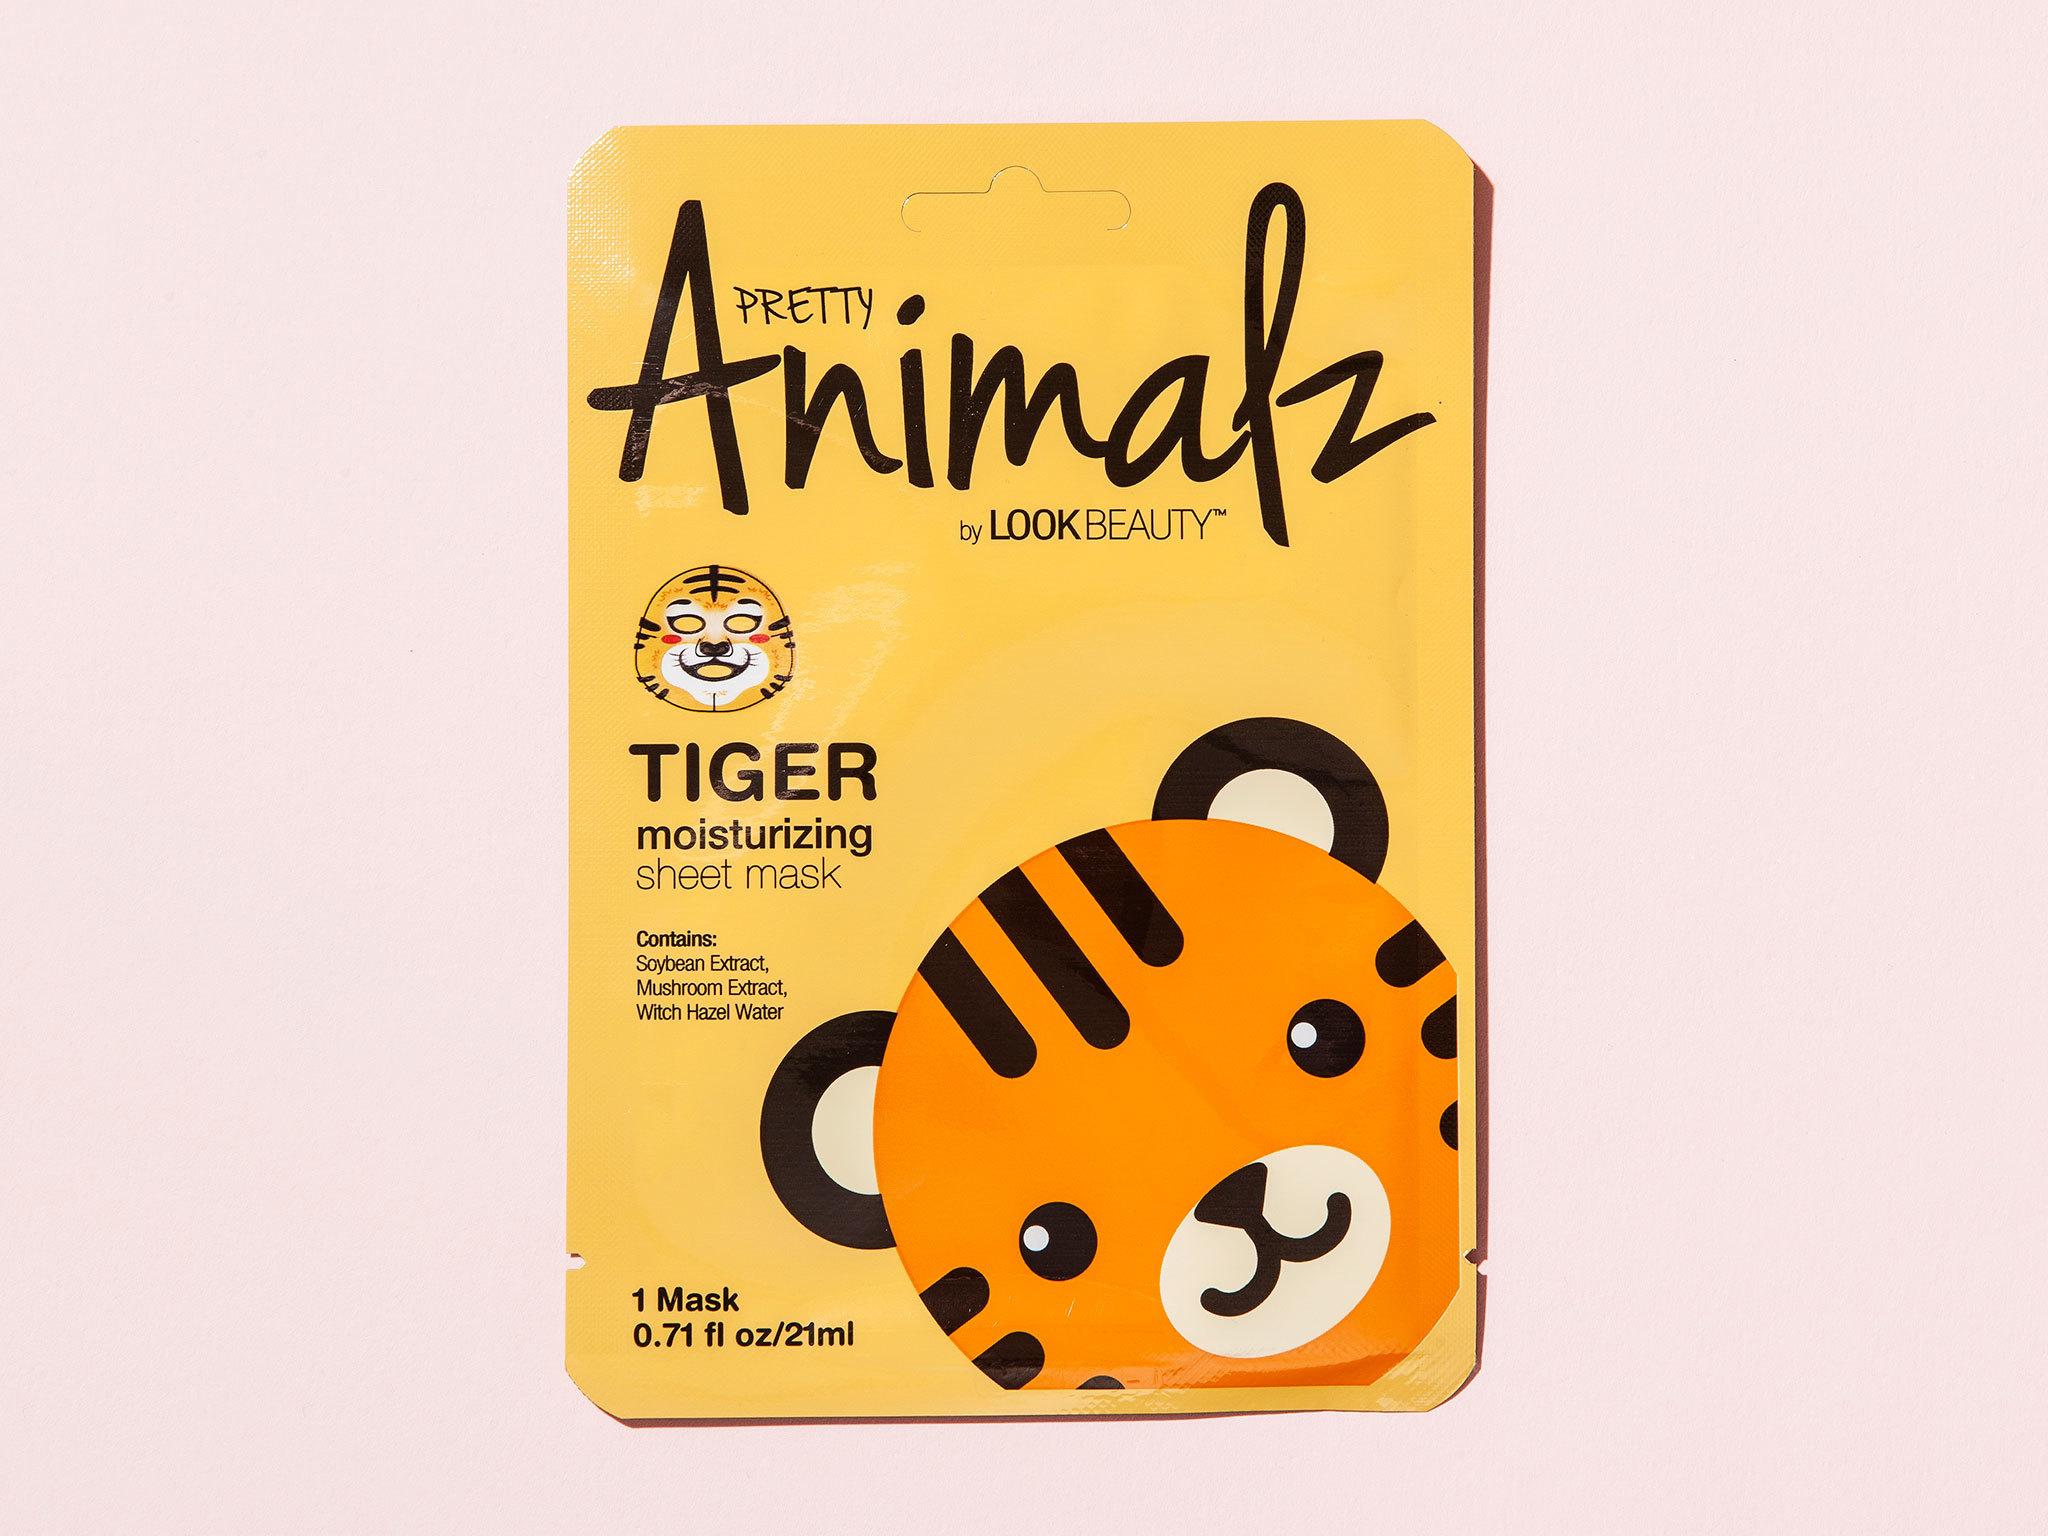 Tiger moisturising sheet mask by Pretty Animalz